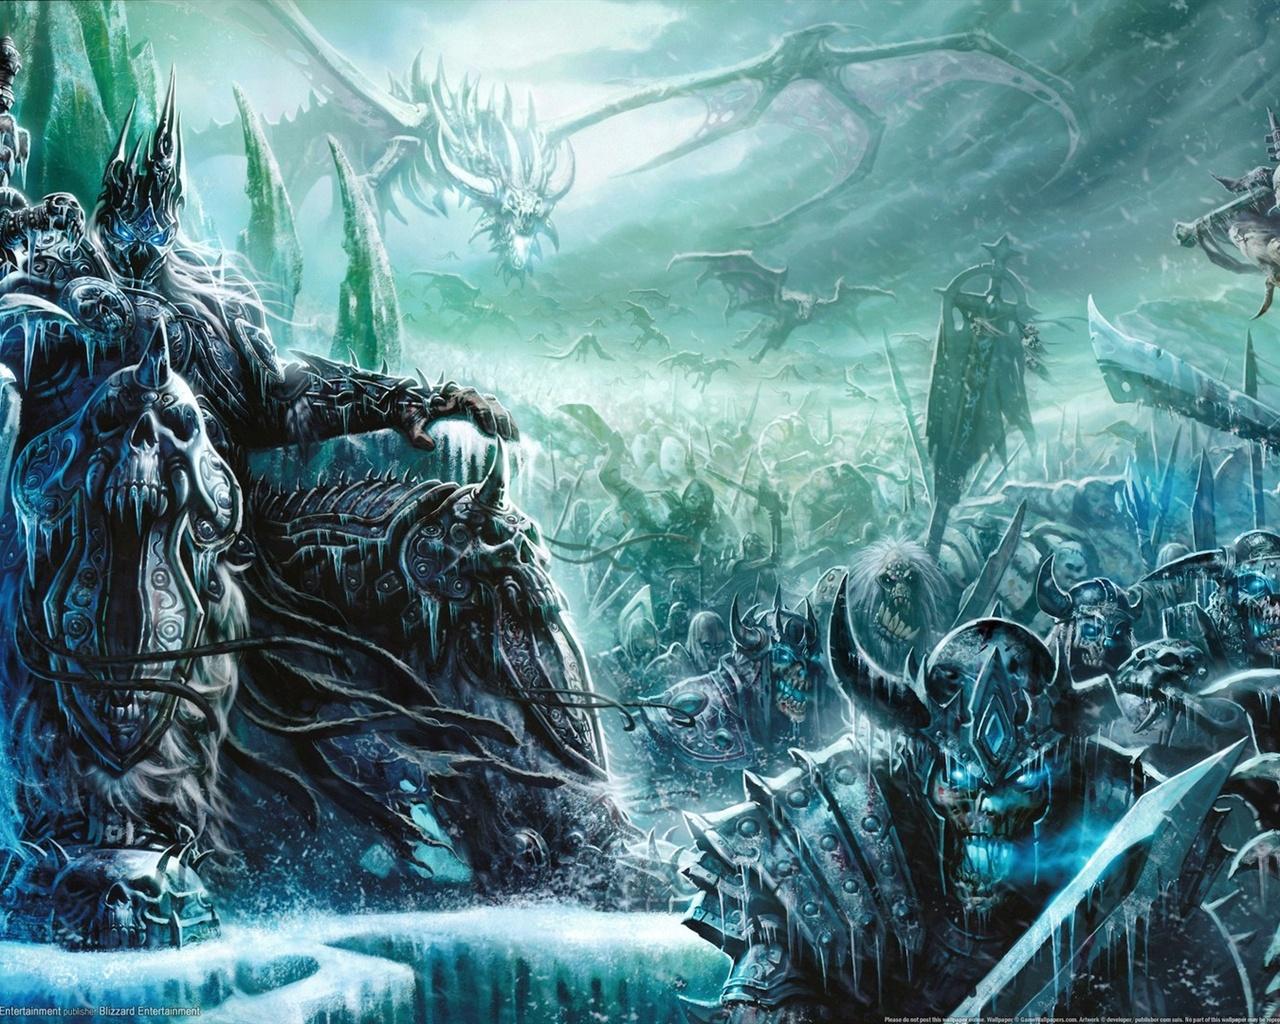 world of warcraft wallpaper 1280x1024 - photo #5